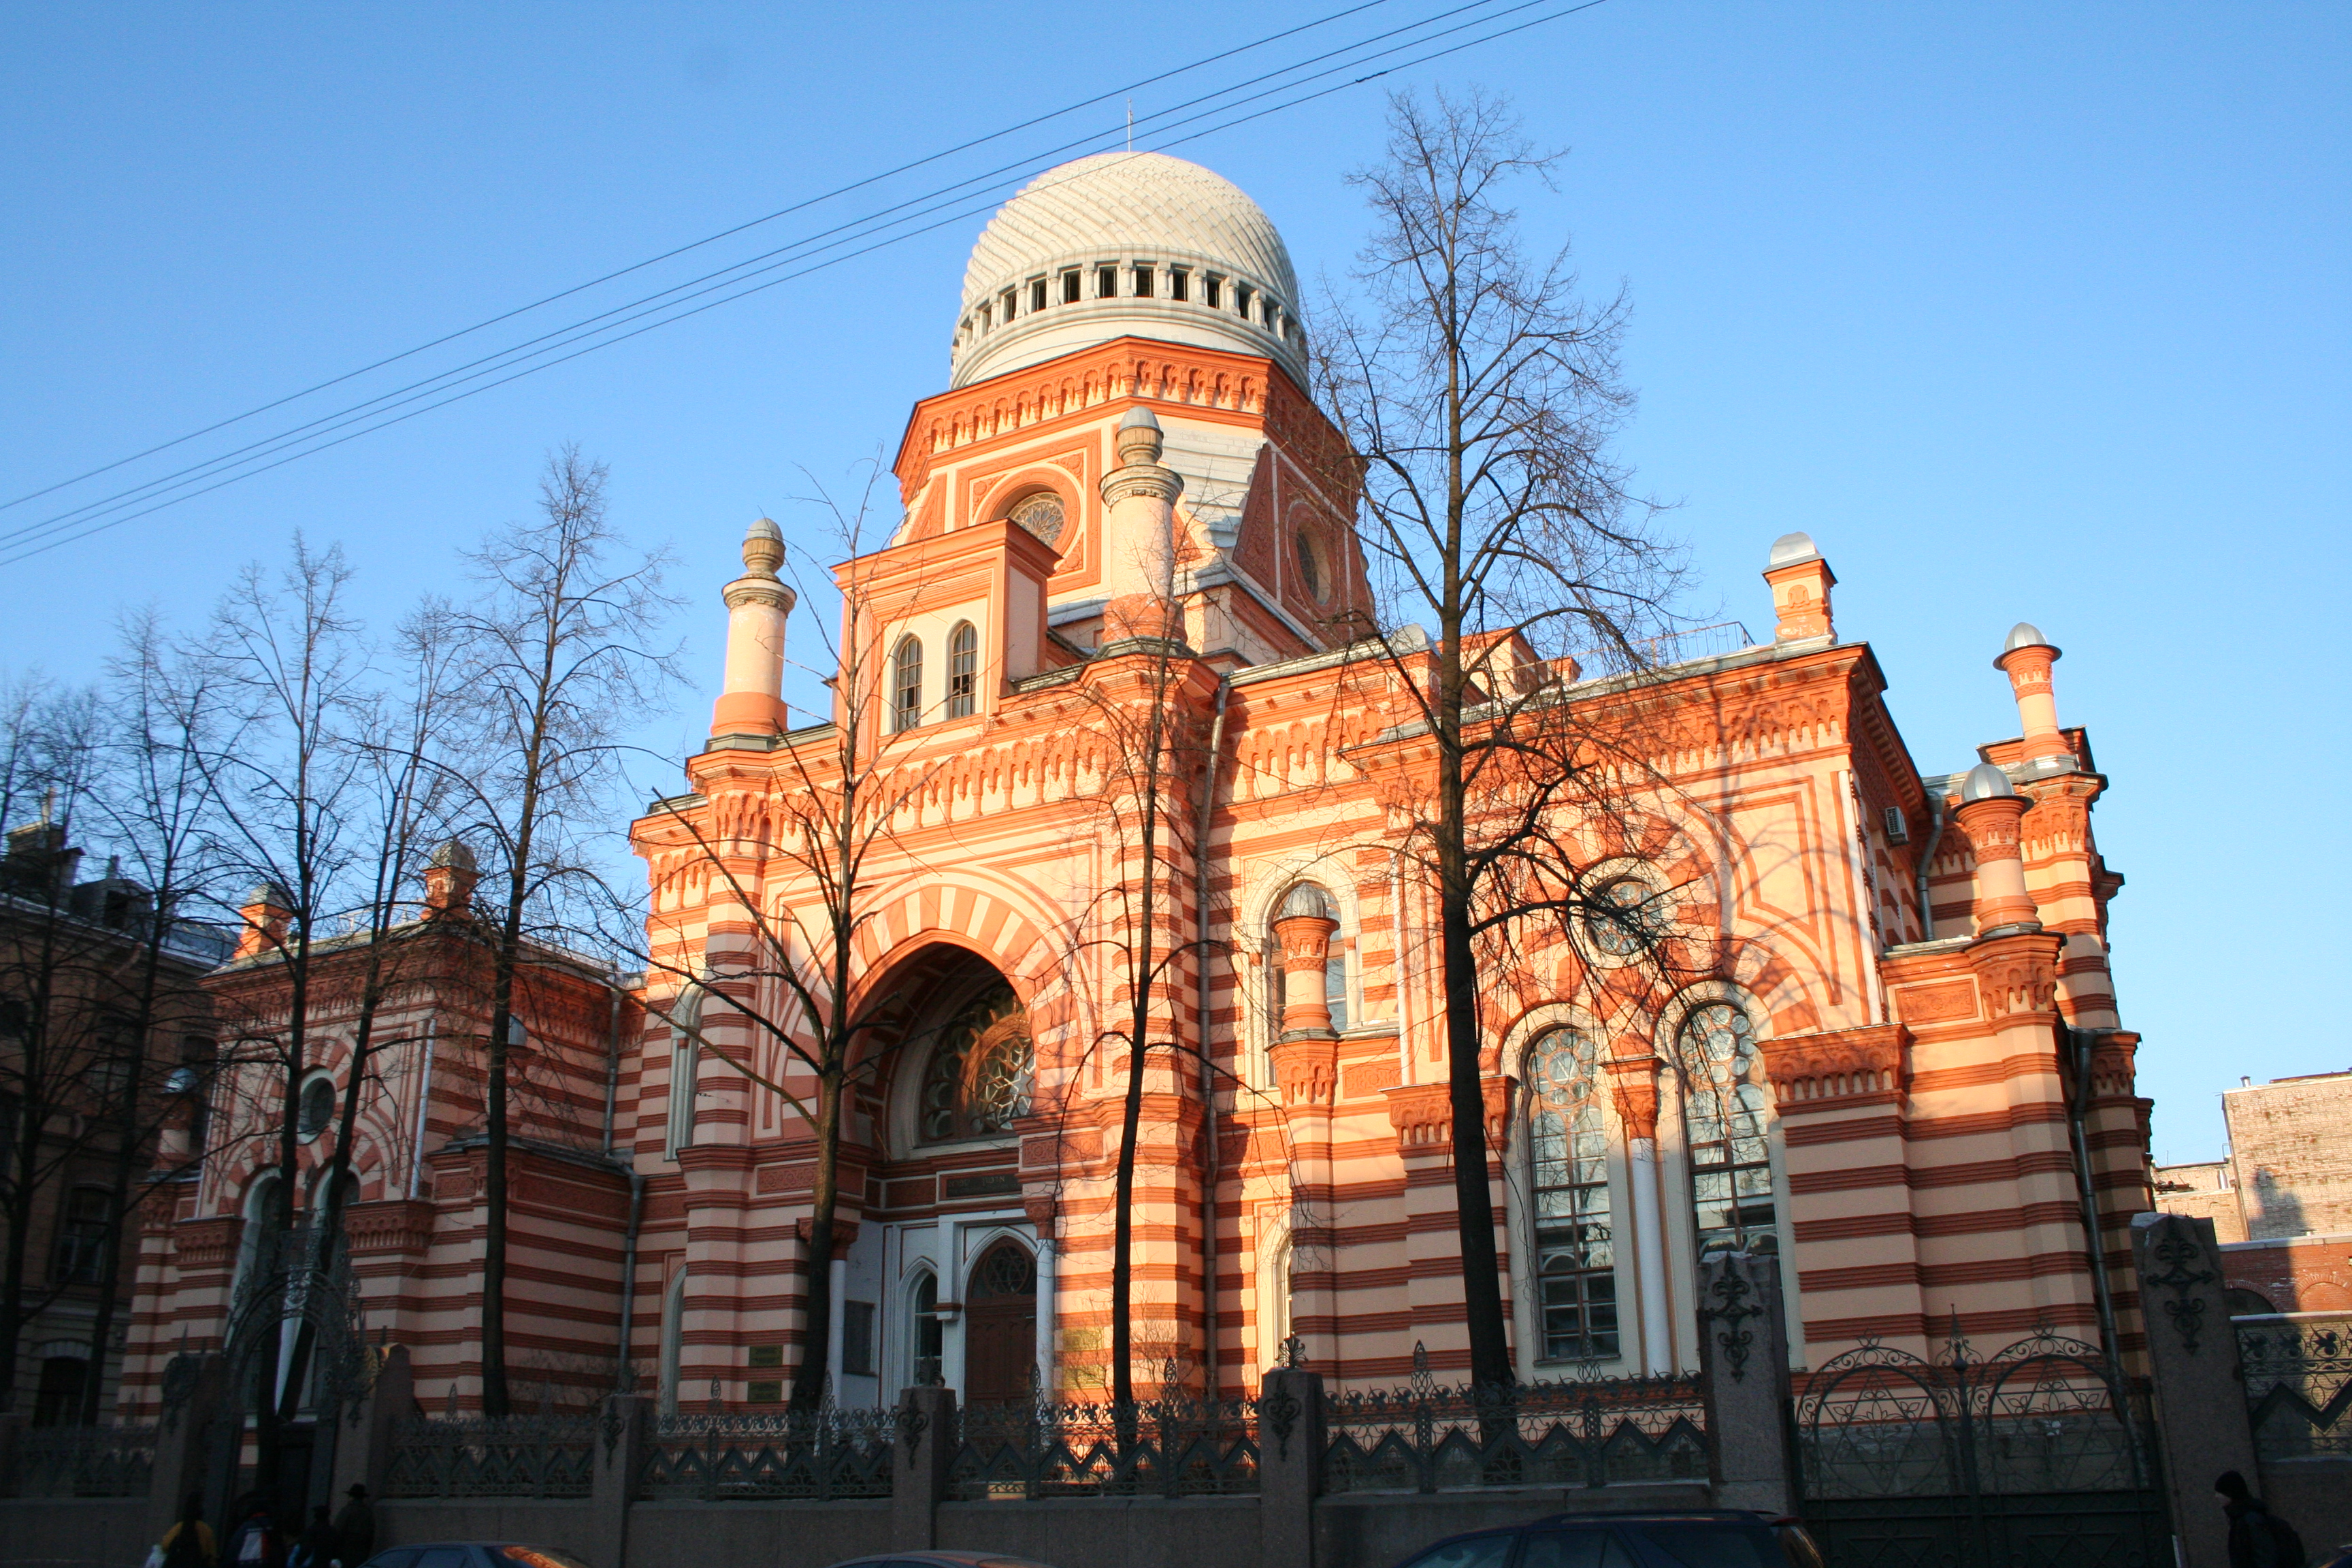 PeterburgskayaSinagoga 29688.jpg